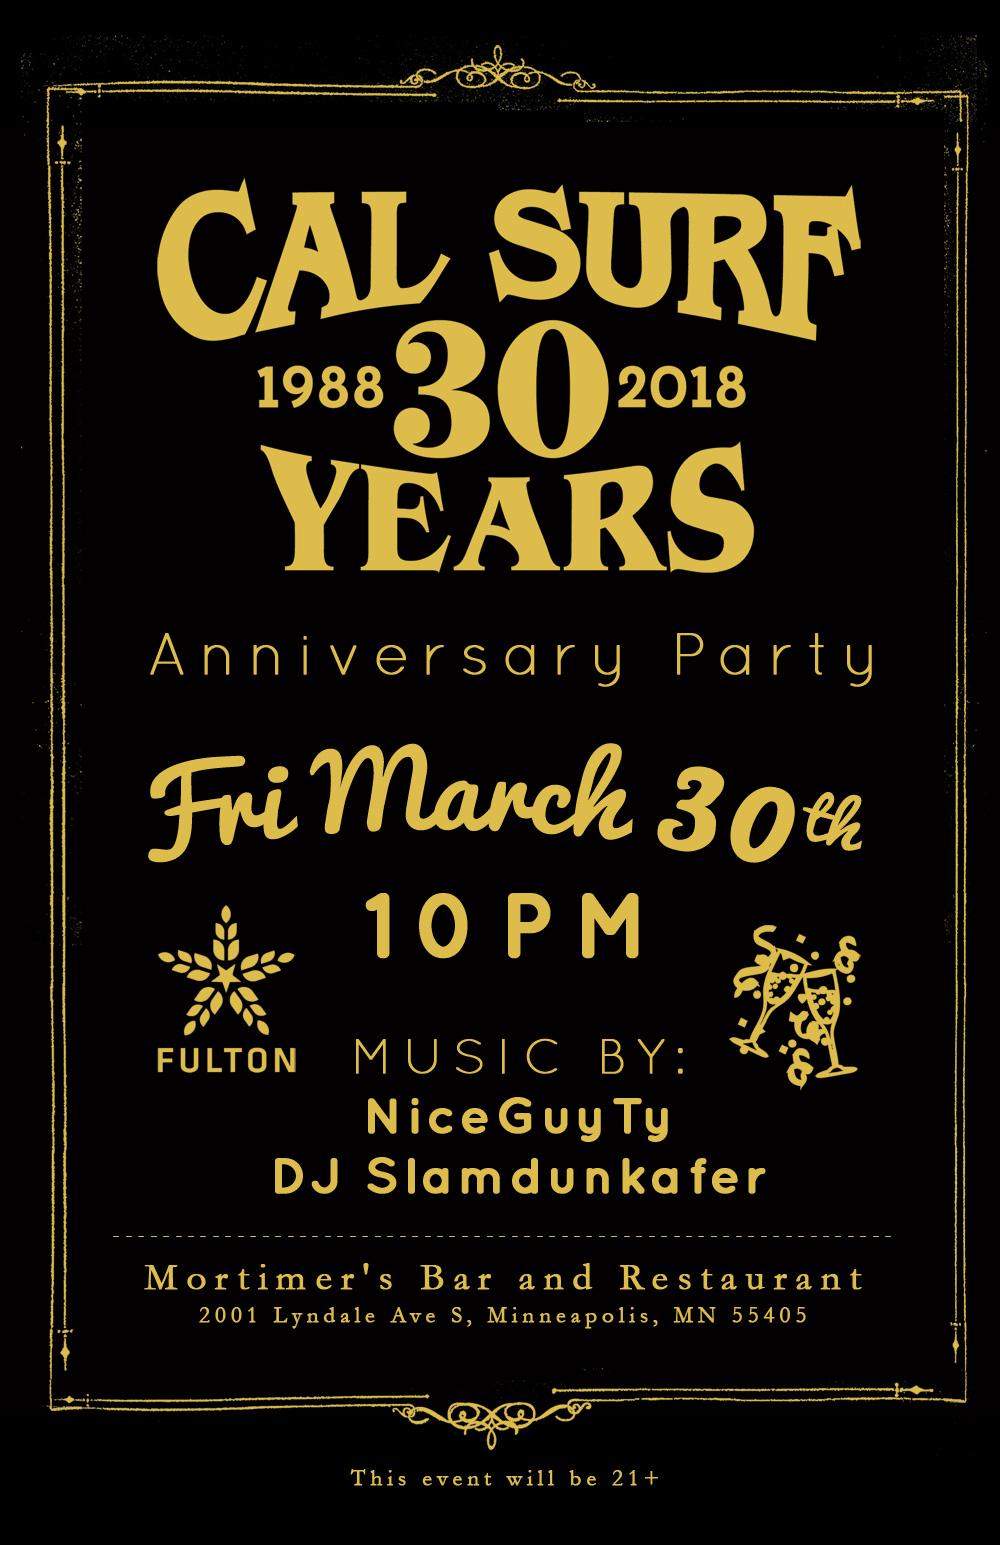 Cal Surf 30 year anniversary